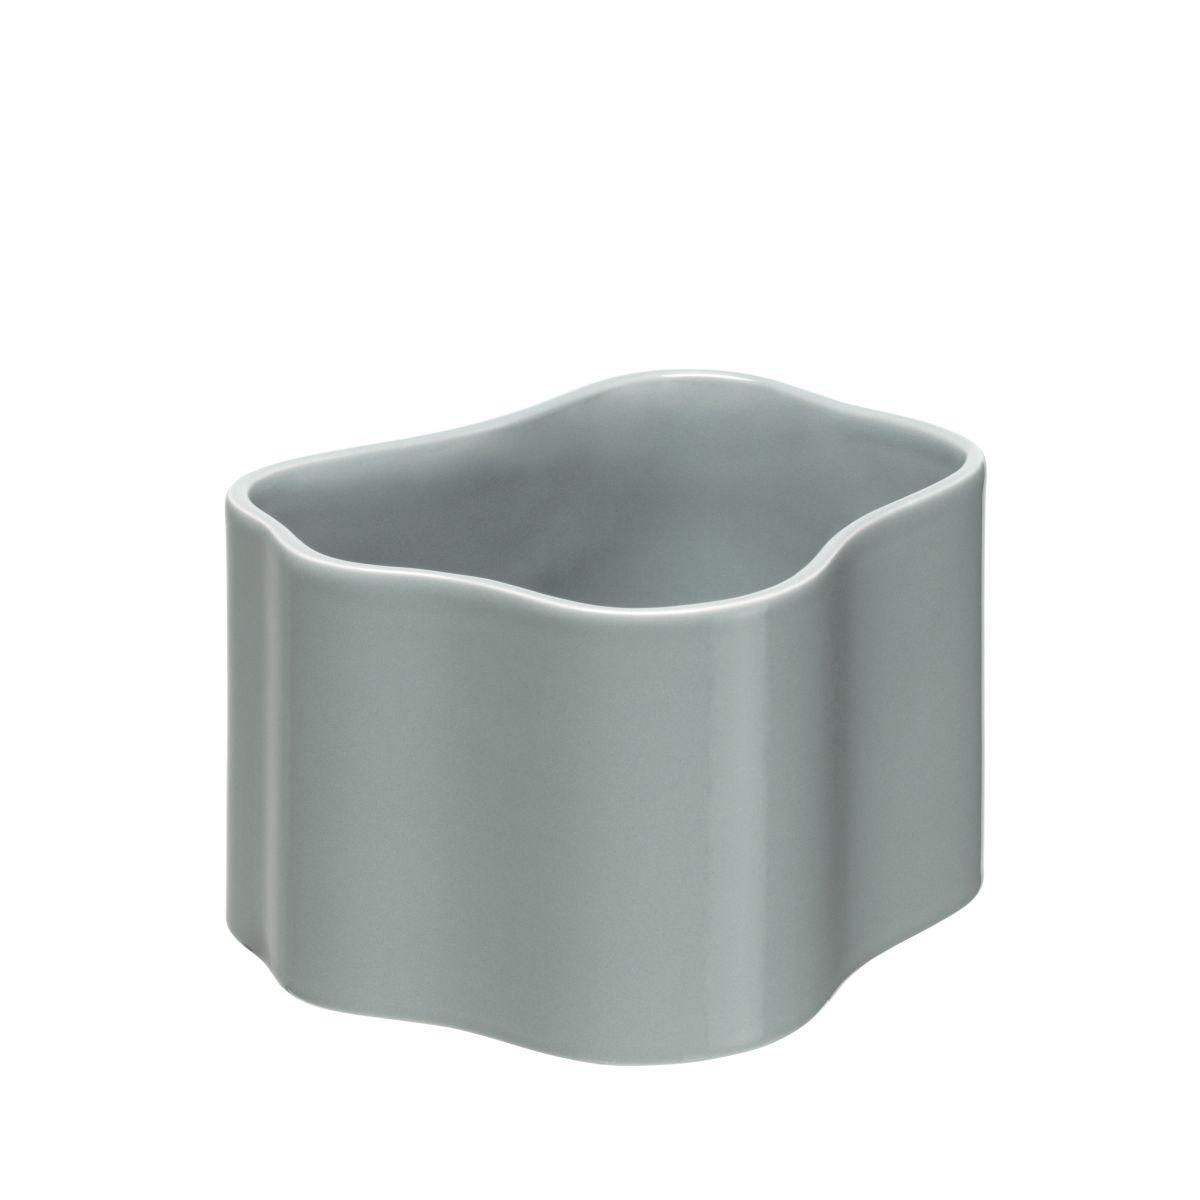 Plant-Pot-Shape-B-Size-S-Light-Grey-Gloss_F-1958482